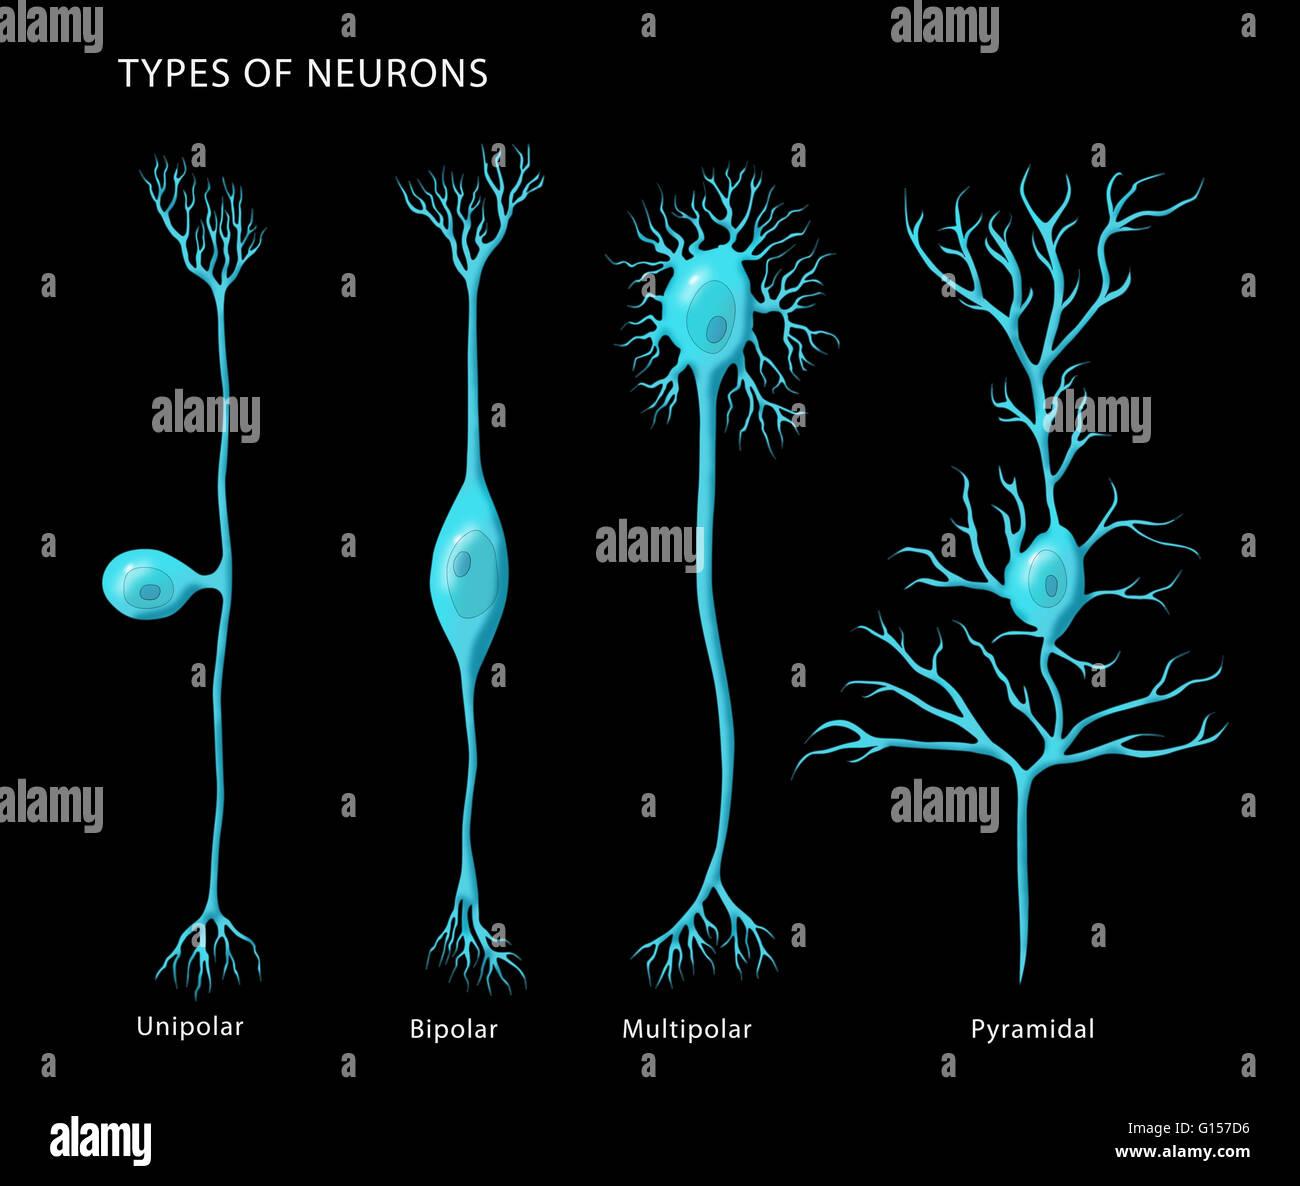 Unipolar Neuron Stock Photos Amp Unipolar Neuron Stock